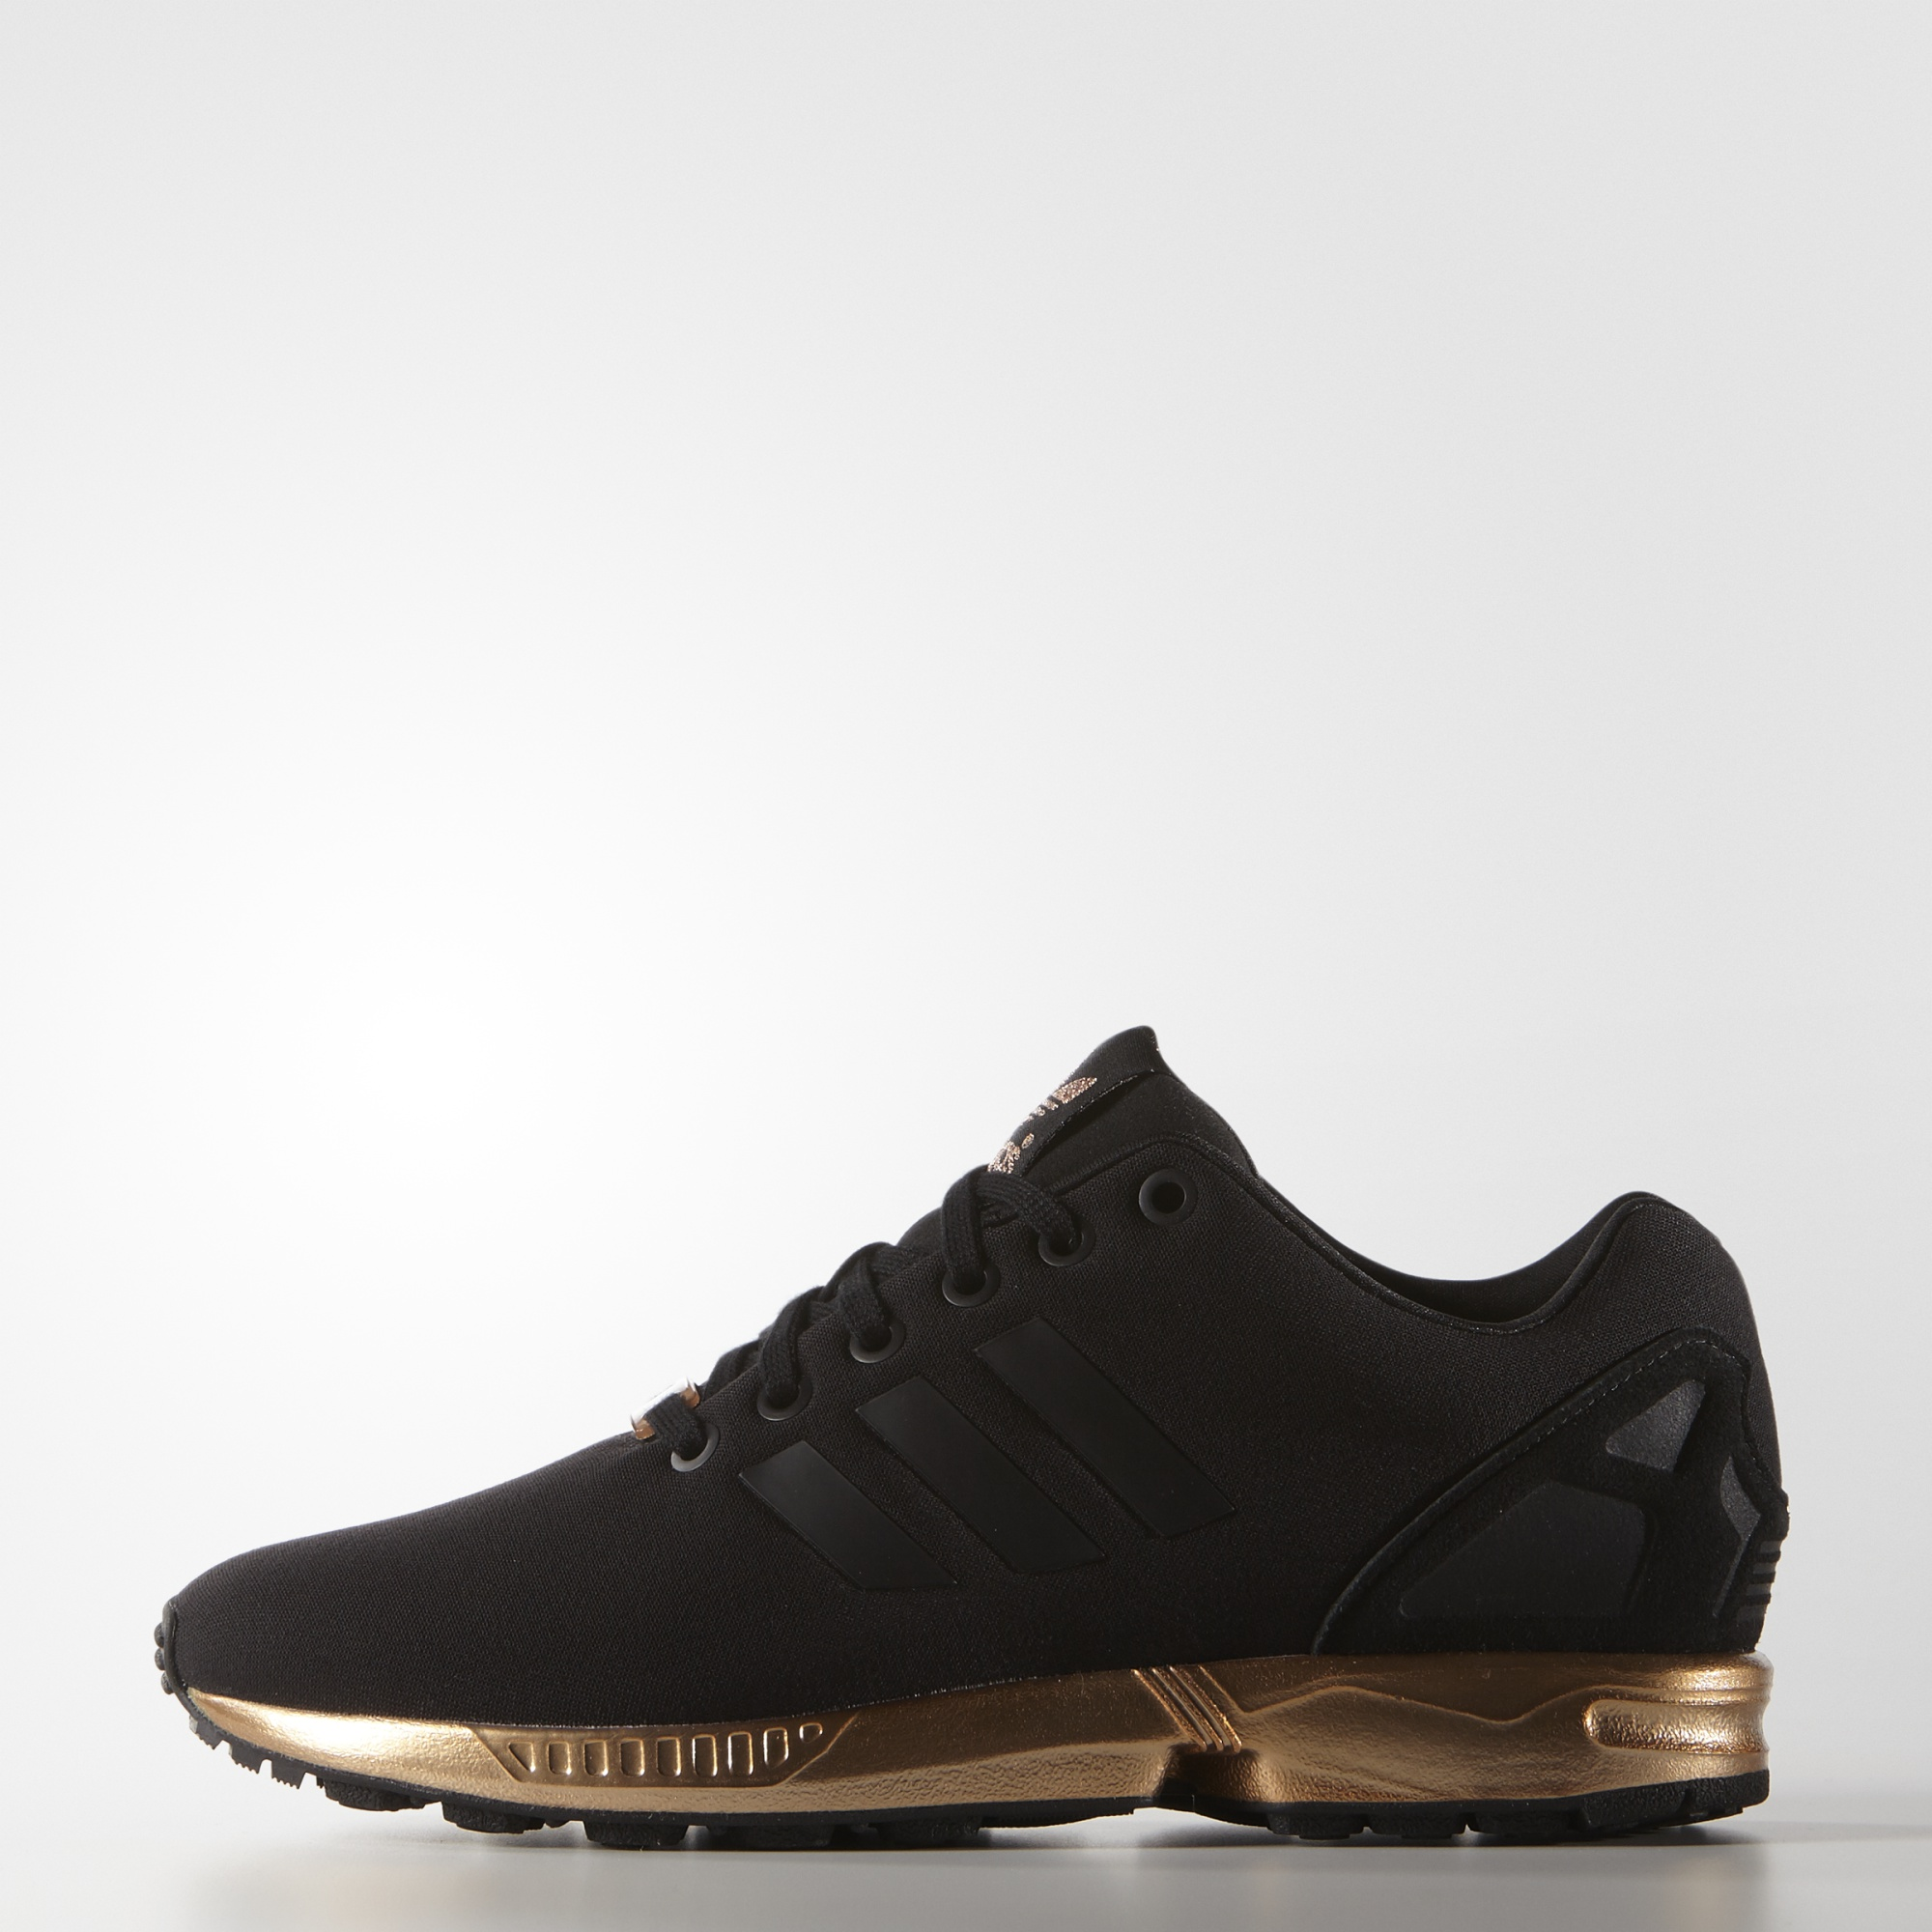 Adidas Zx Flux Black Gold Kopen